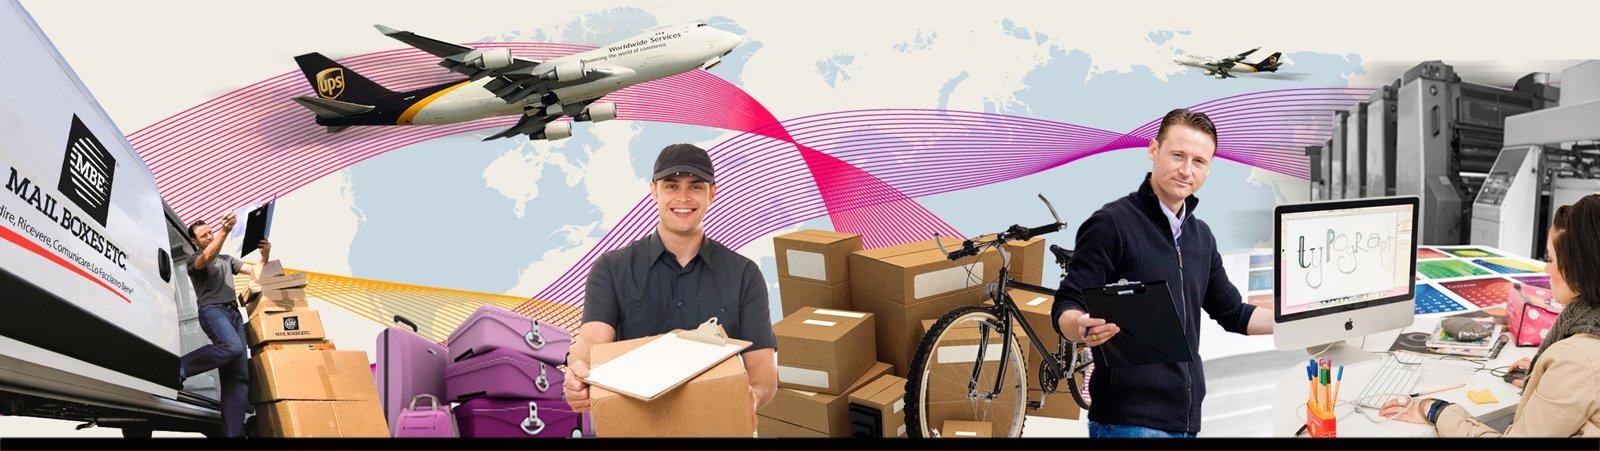 Transportes internacionales en Torrent